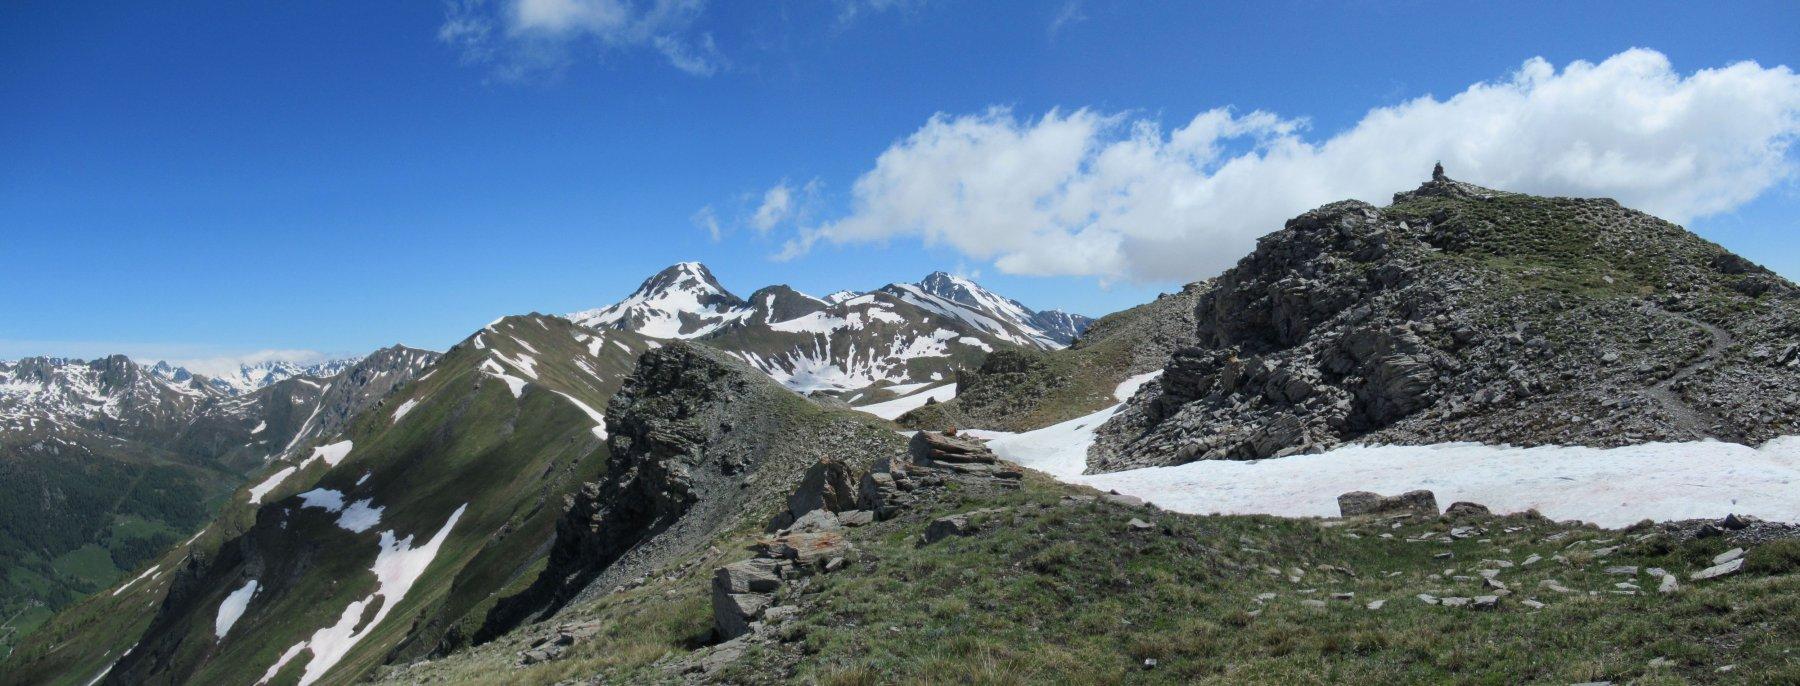 Punta Ollietta con a sx Rosso Vertosan, Leysser e Fallere